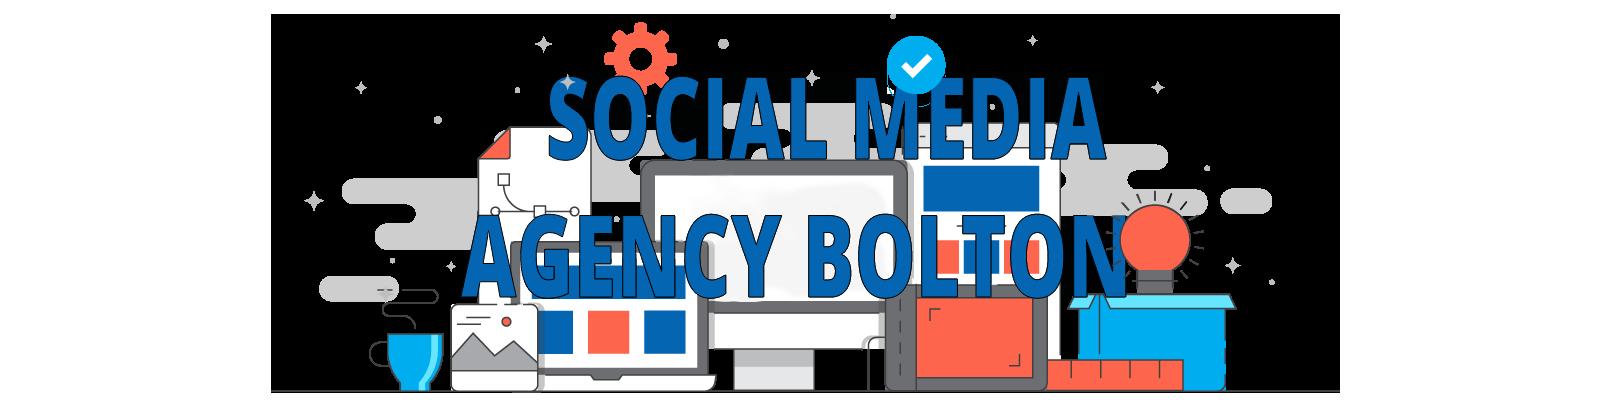 seek social social media agency bolton header with transparent background